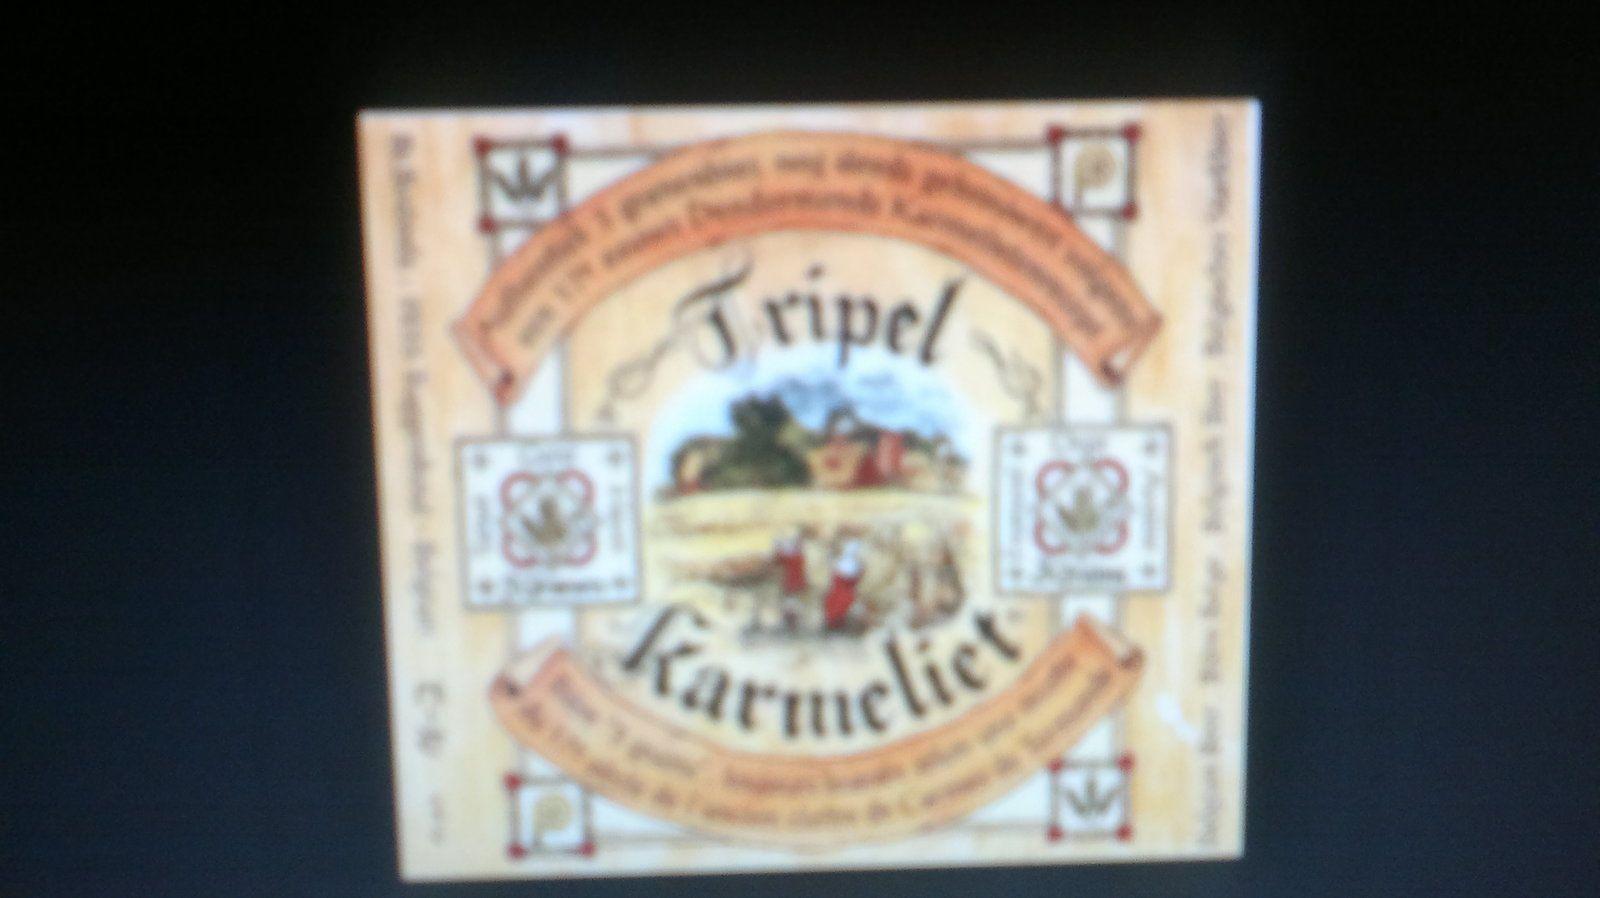 Top Karmeliet - auxmillebieres.over-blog.com IX91